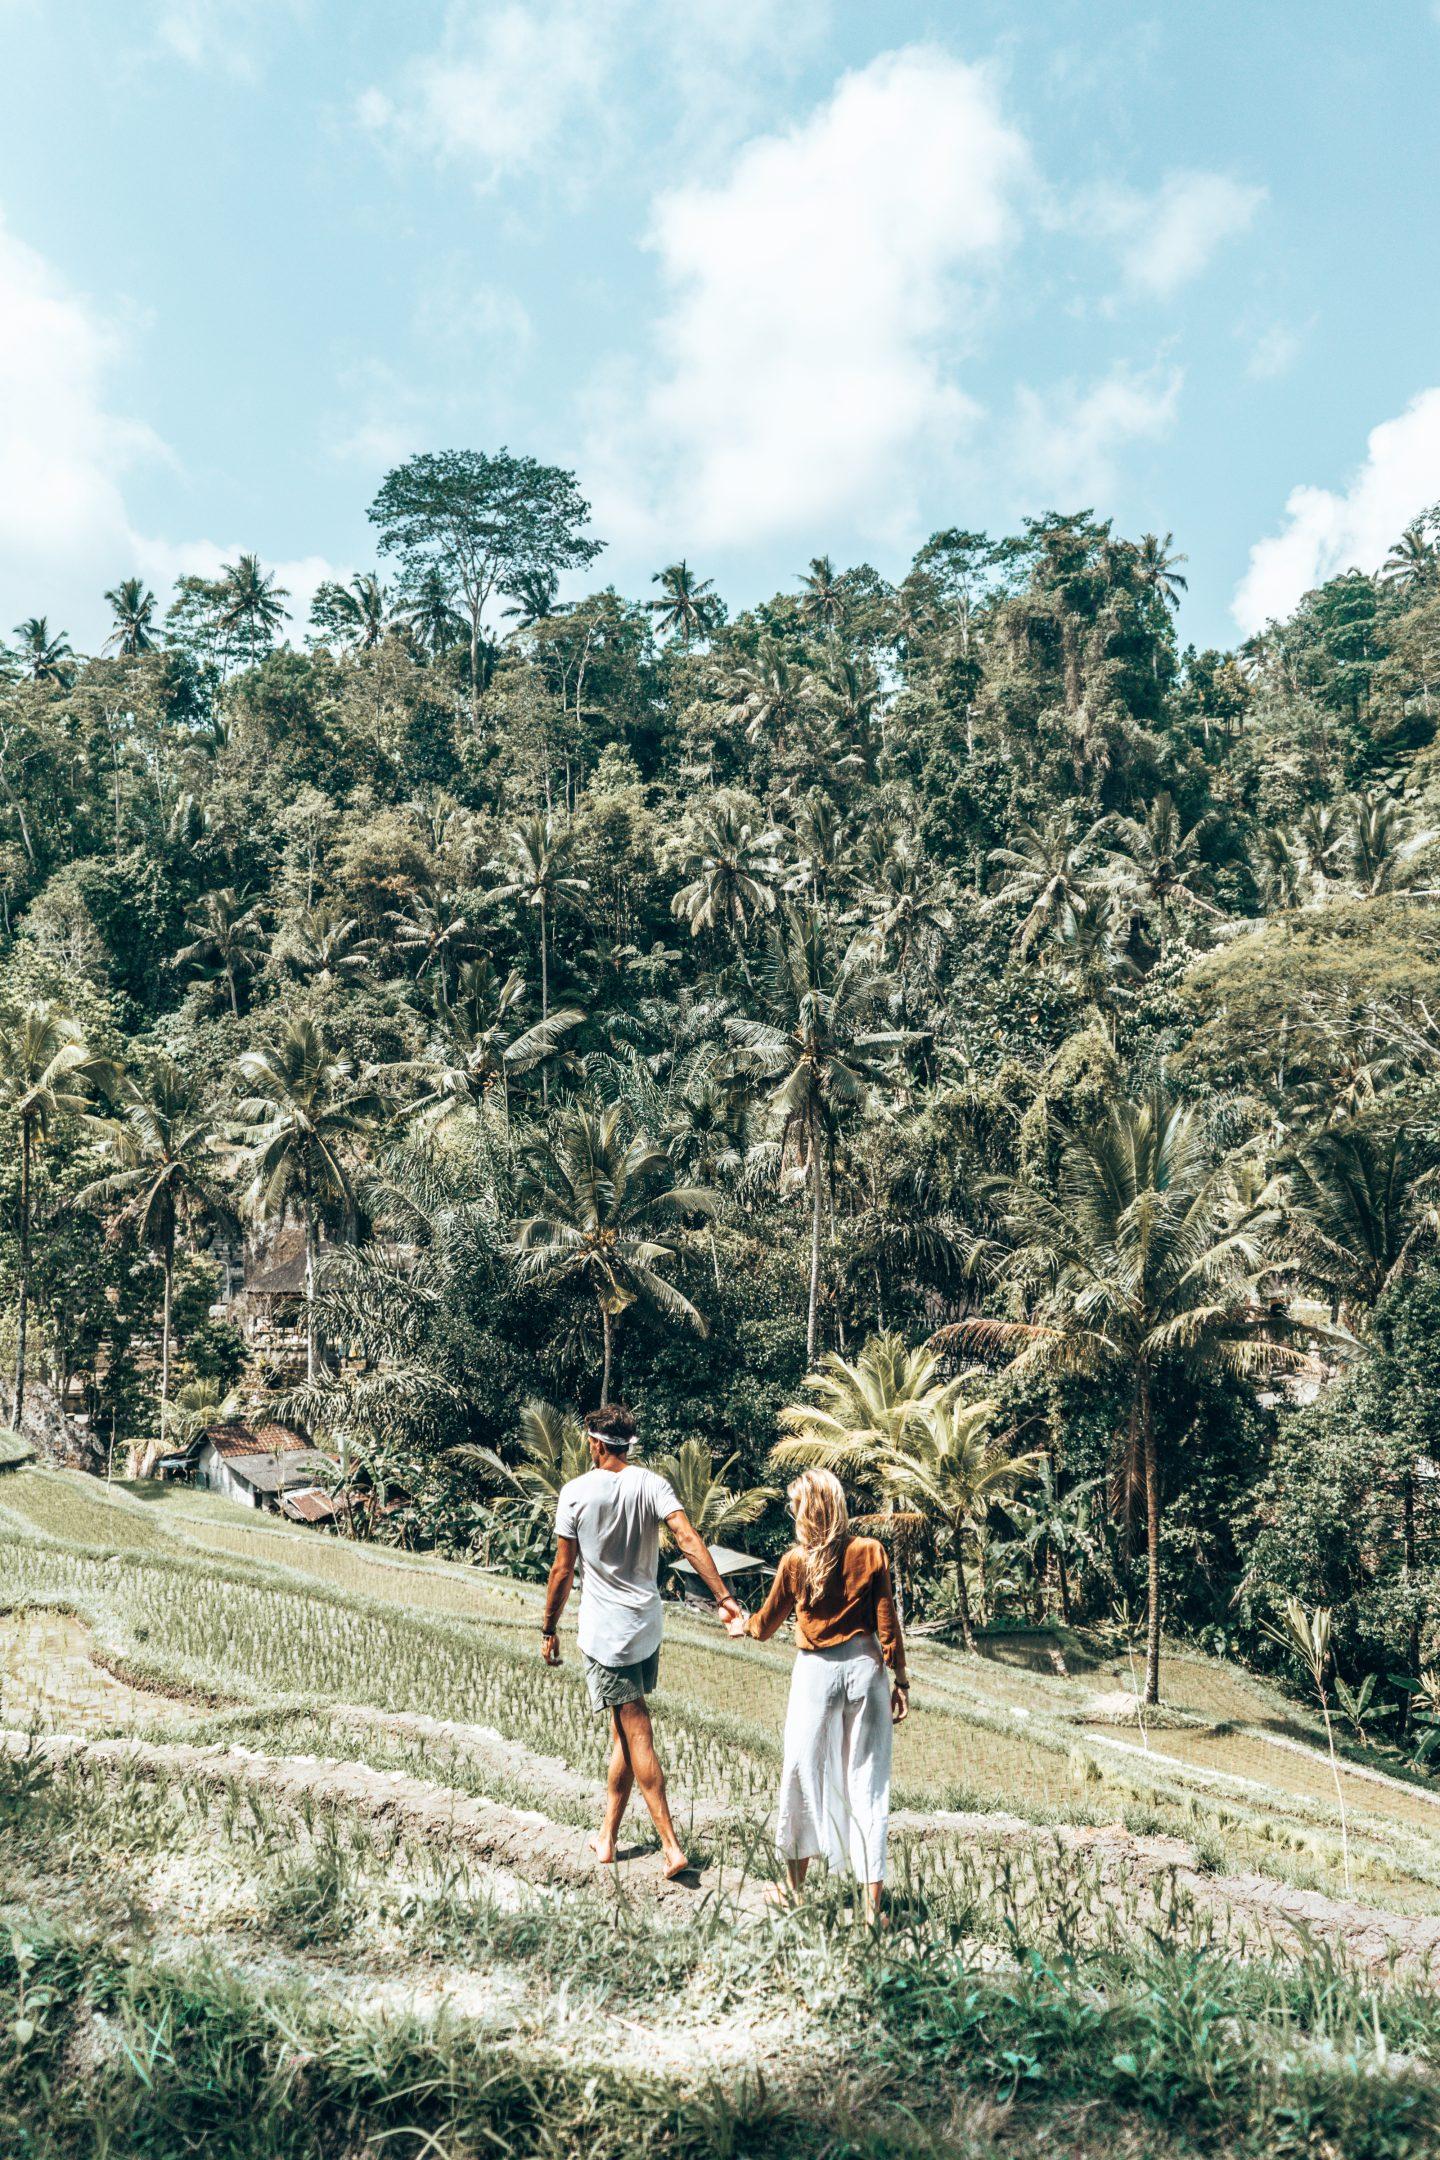 rice terraces - 3-WEEK INDONESIA GUIDE